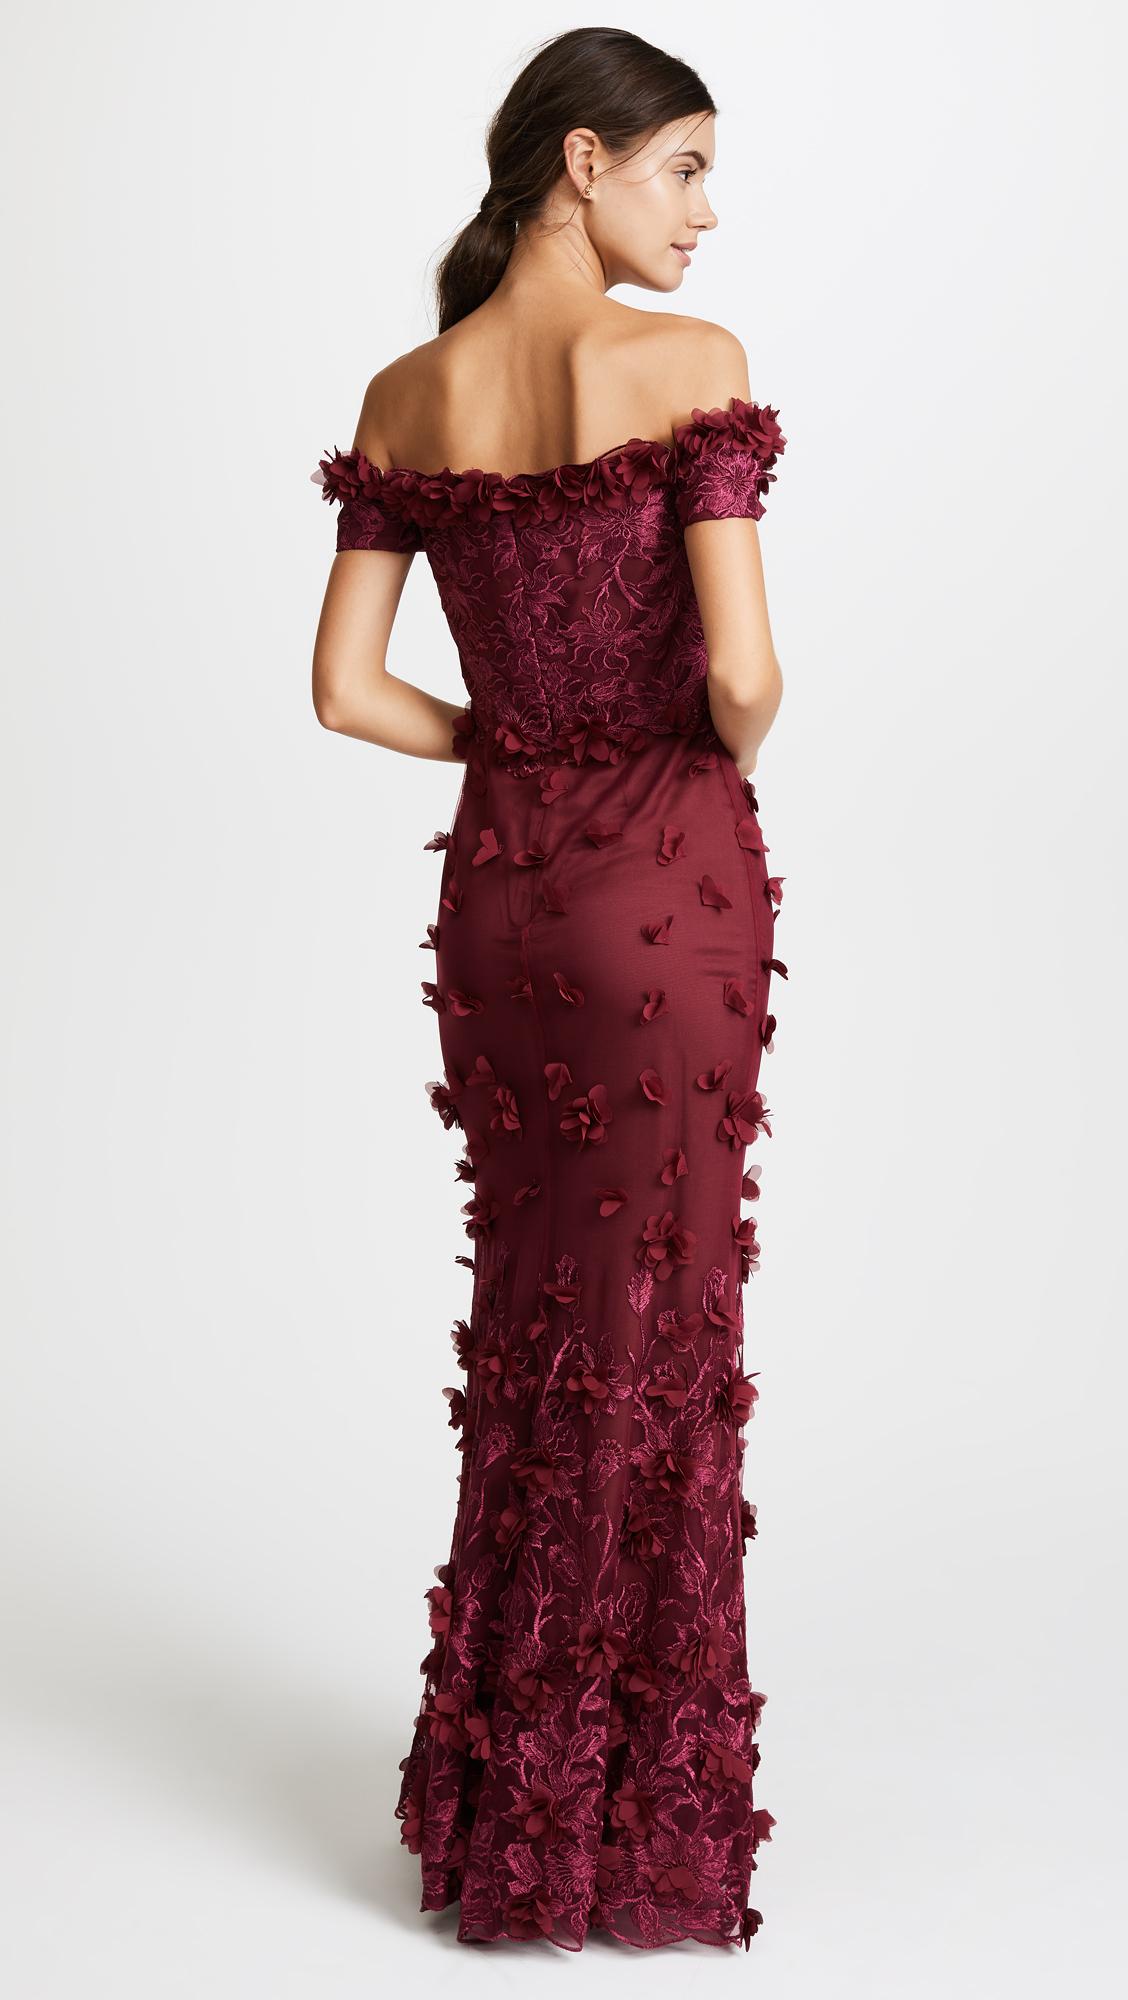 c9498e291af Marchesa Notte Off the Shoulder Embroidered Gown